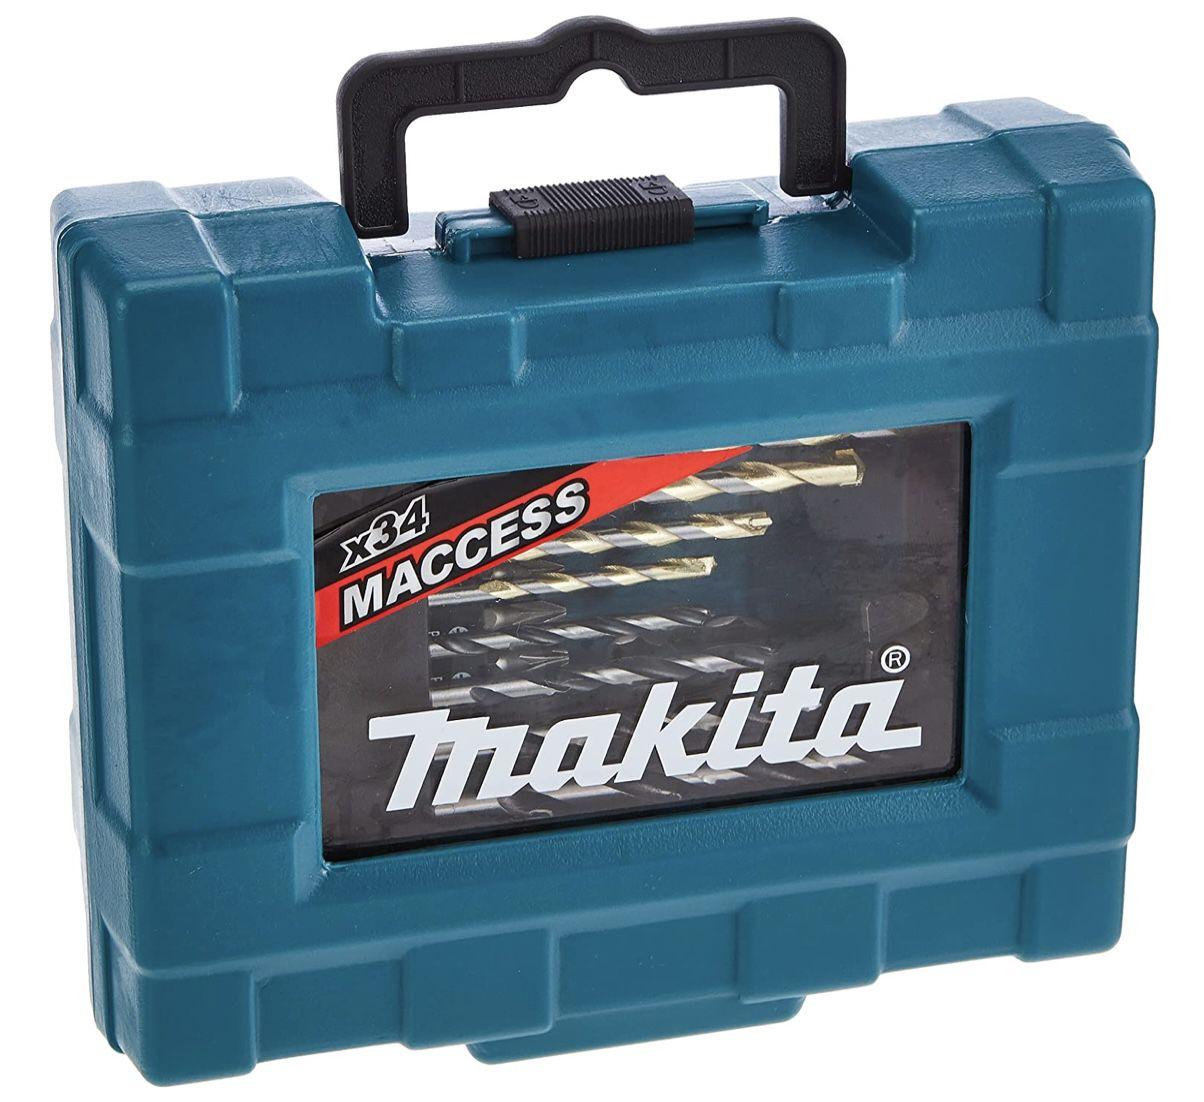 Makita D 36980 Bohrer Bit Set (34tlg) für 16,29€ (statt 23€)